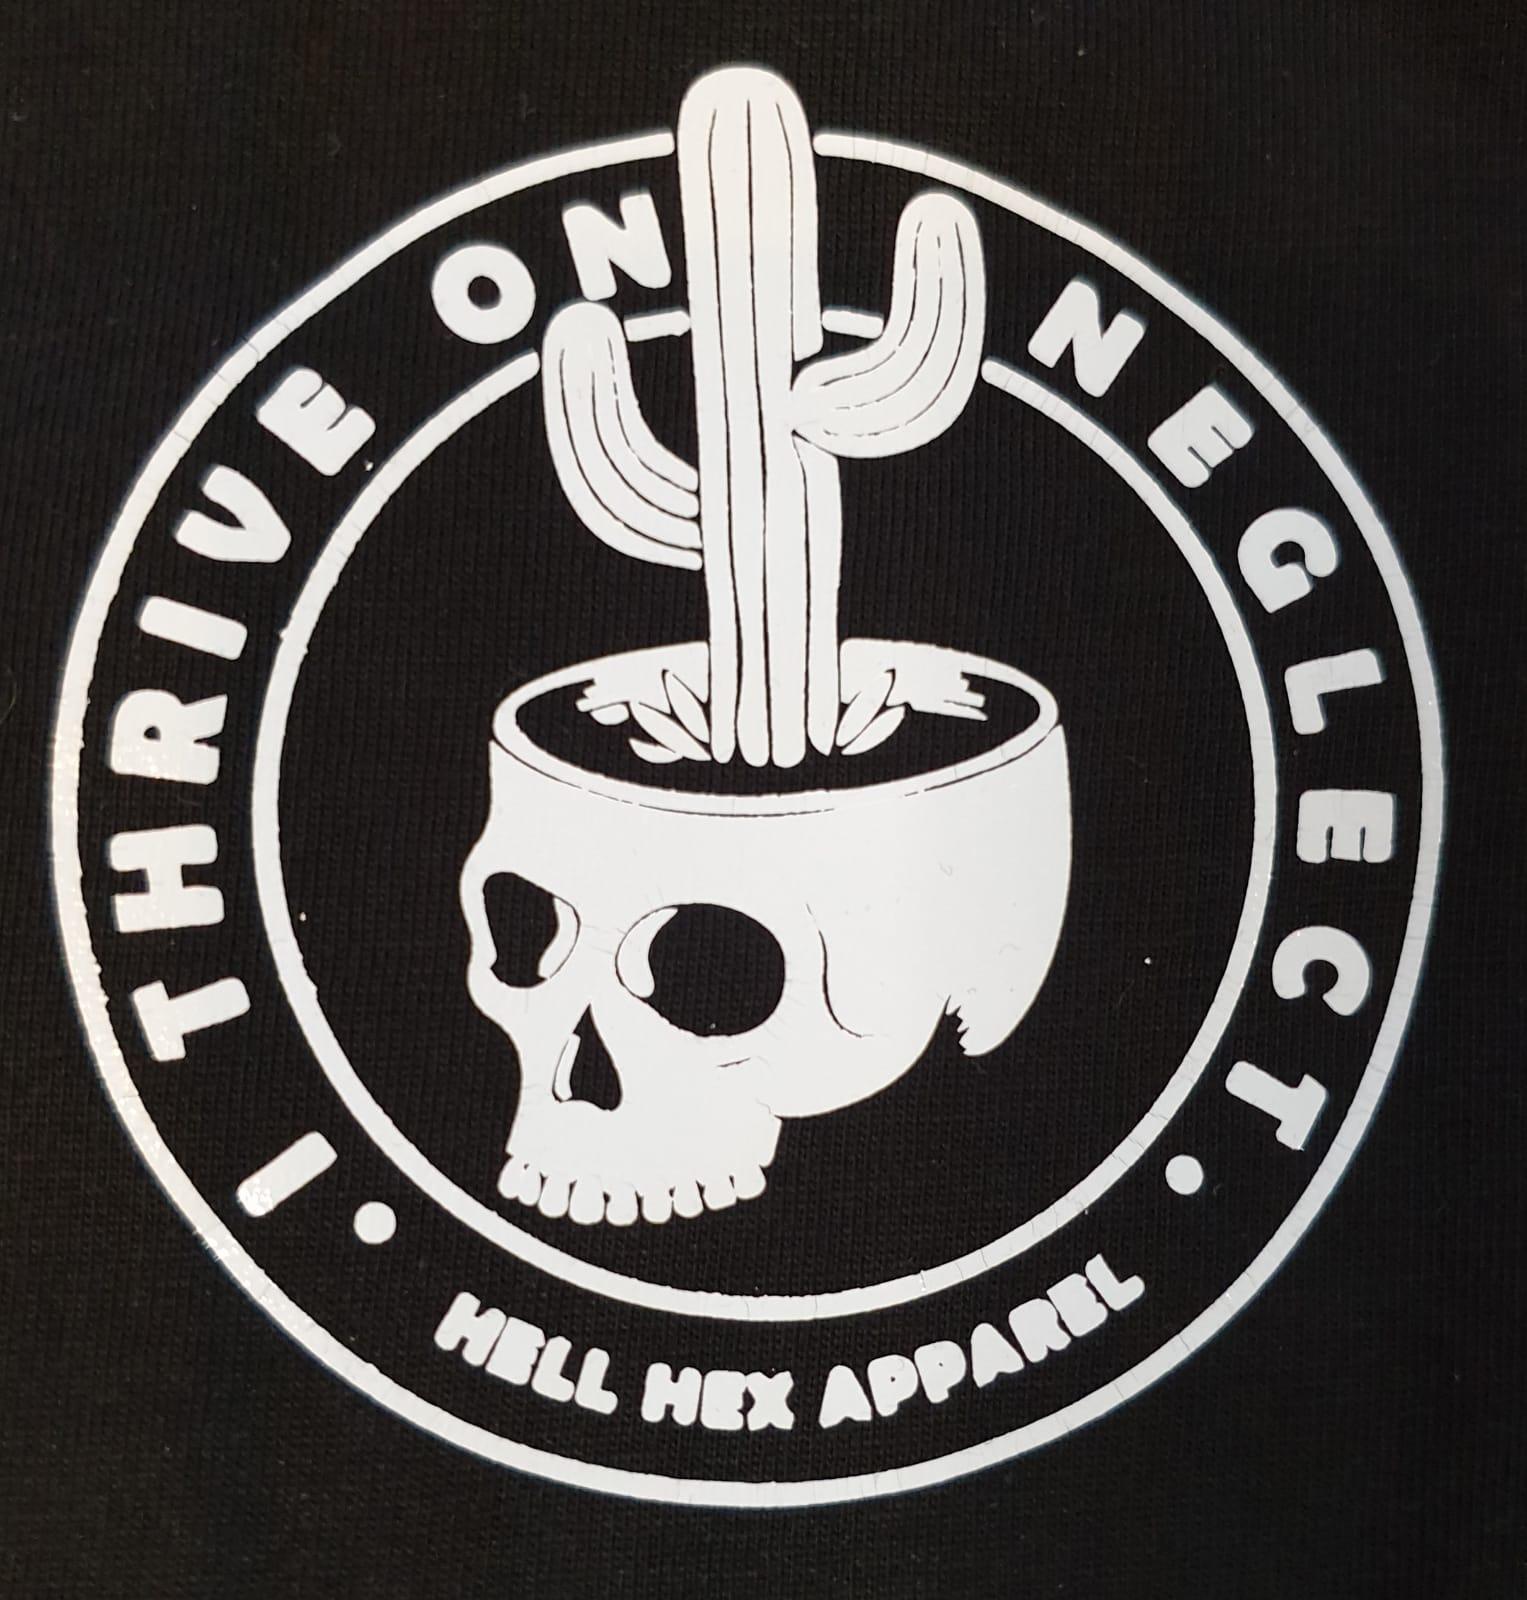 Hell hex apparel design